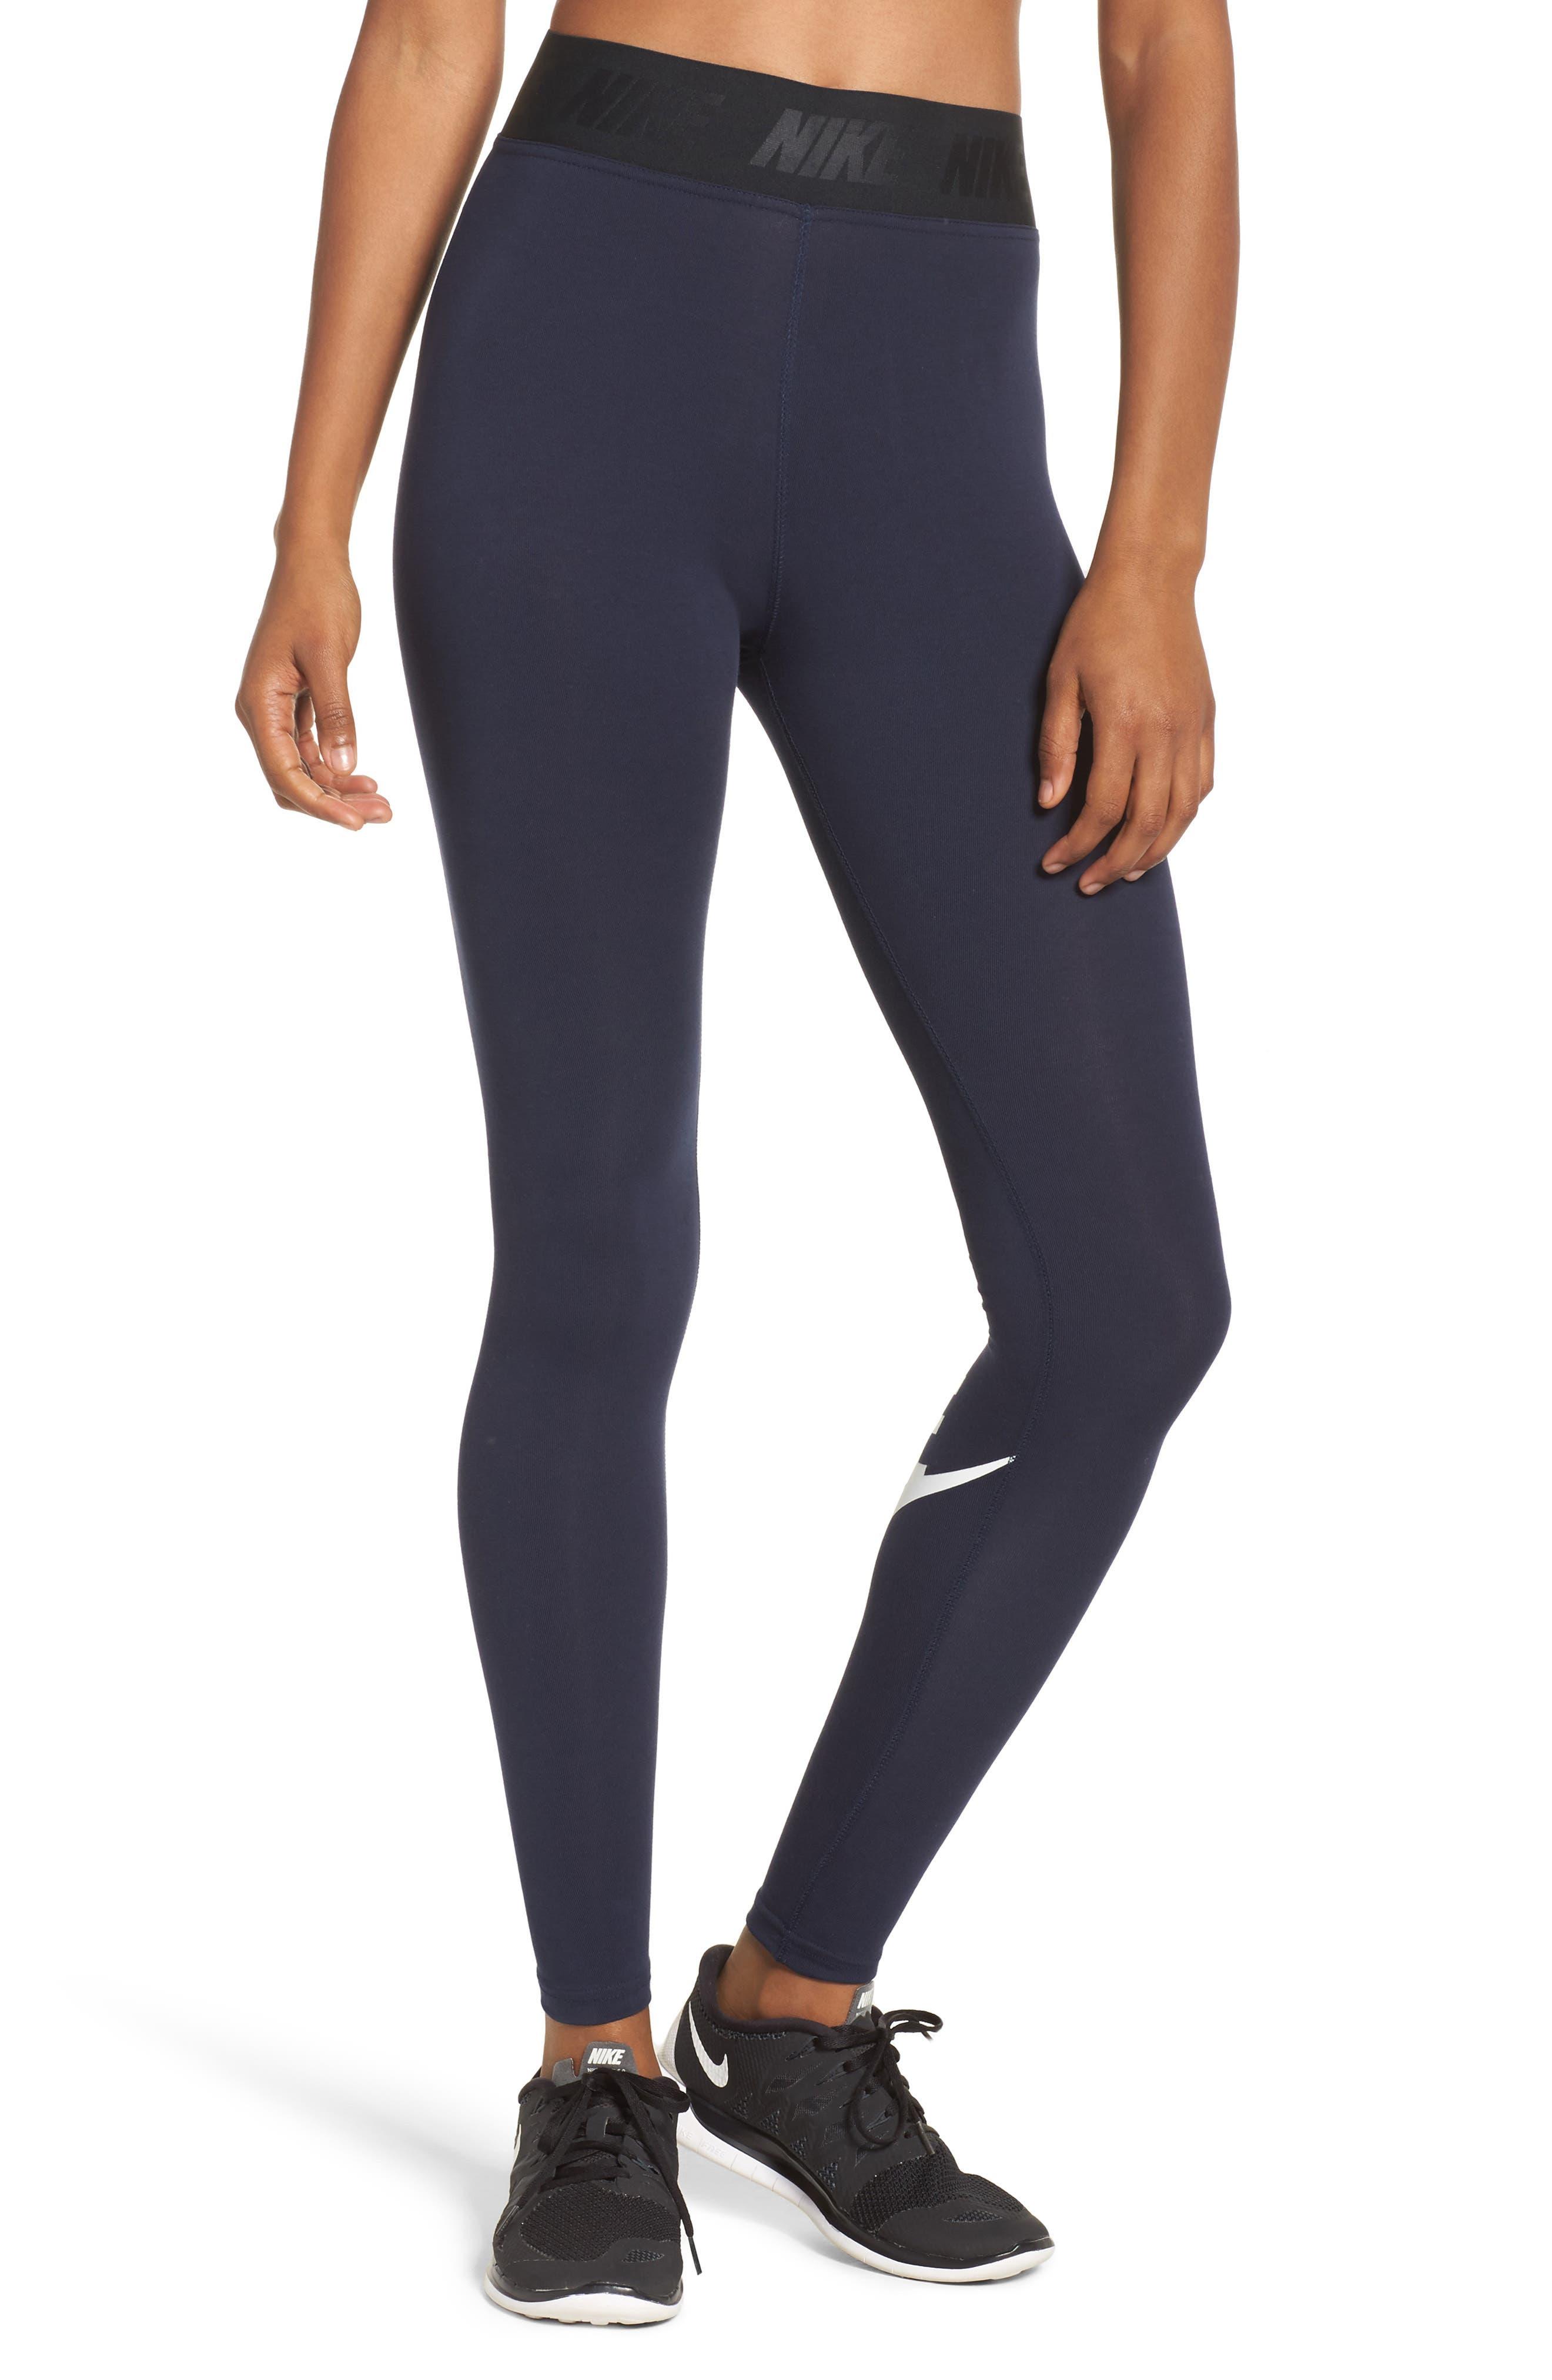 Main Image - Nike Leg-a-See High Waist Leggings